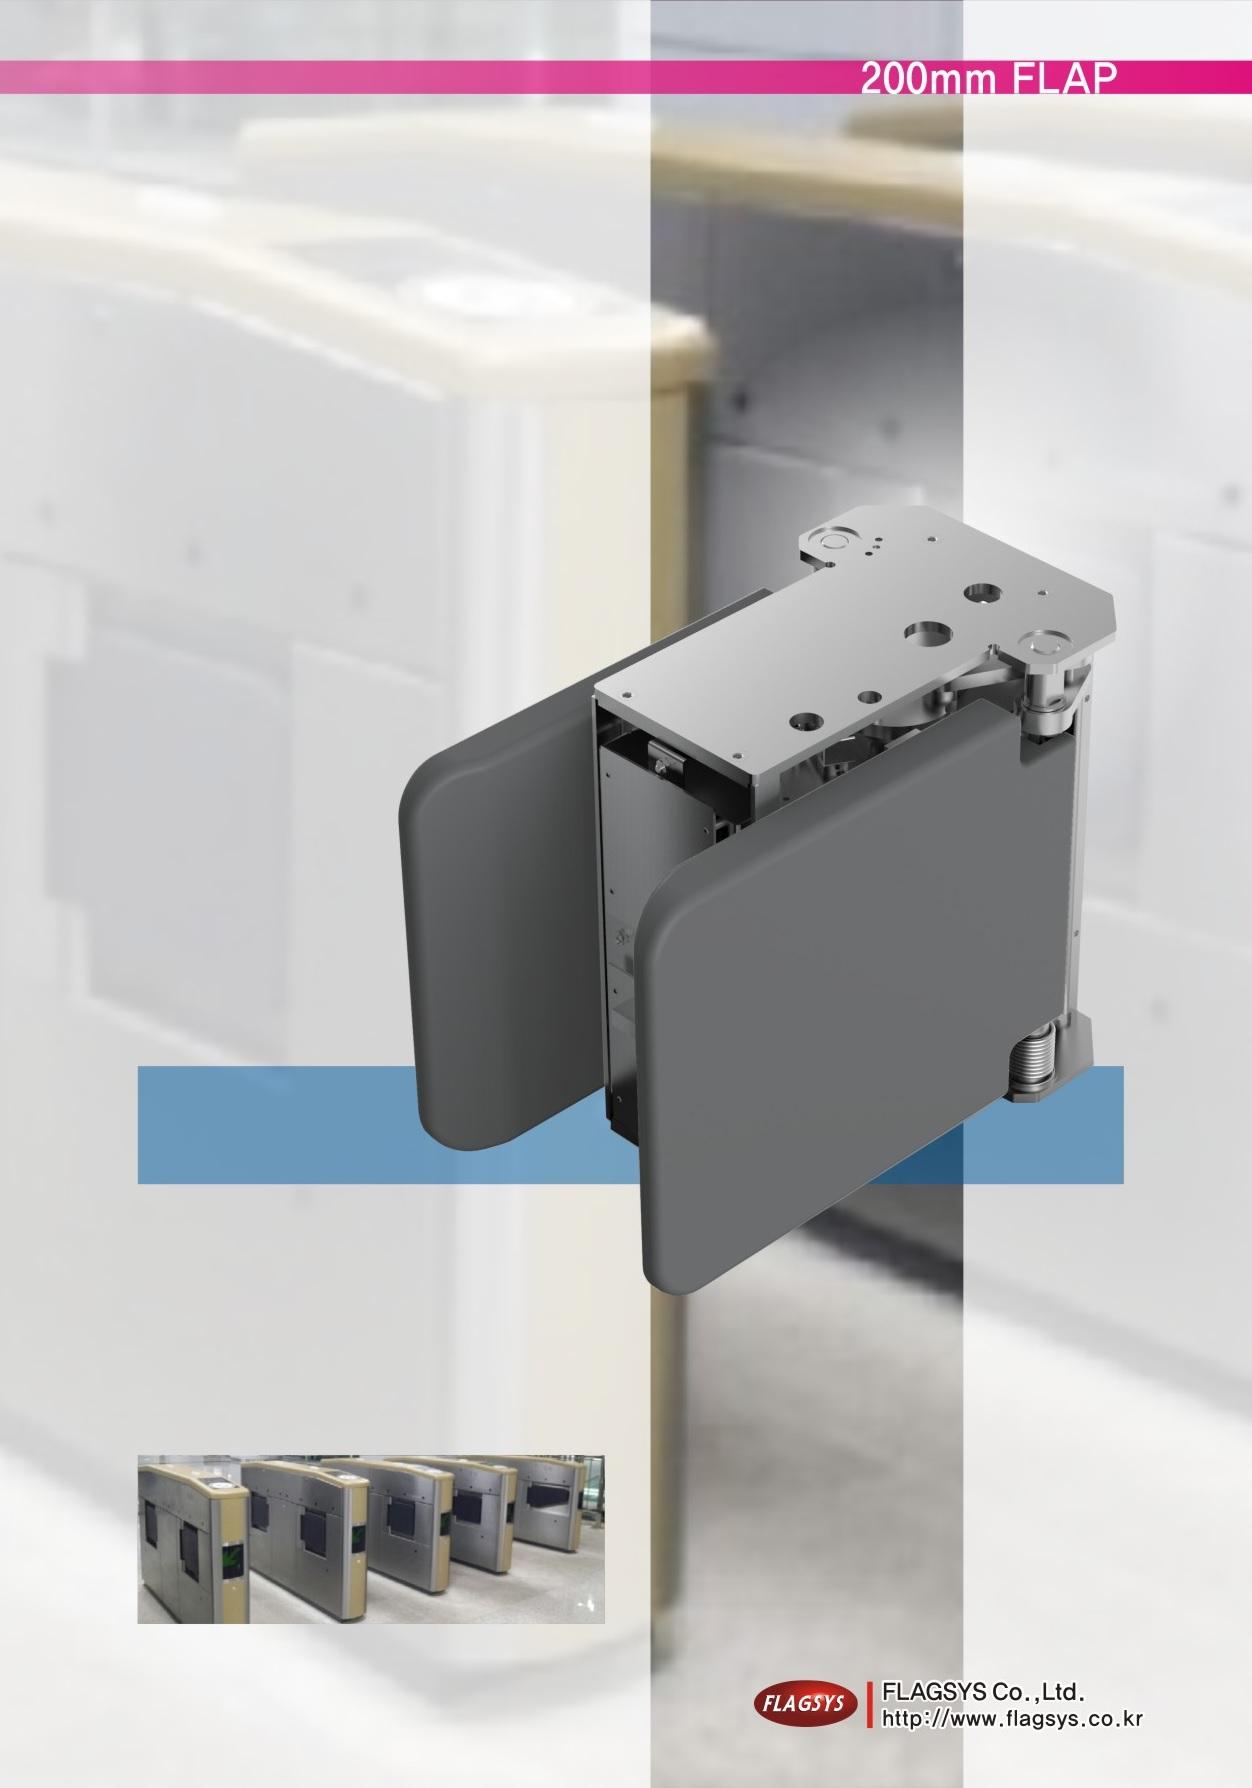 200mm flap